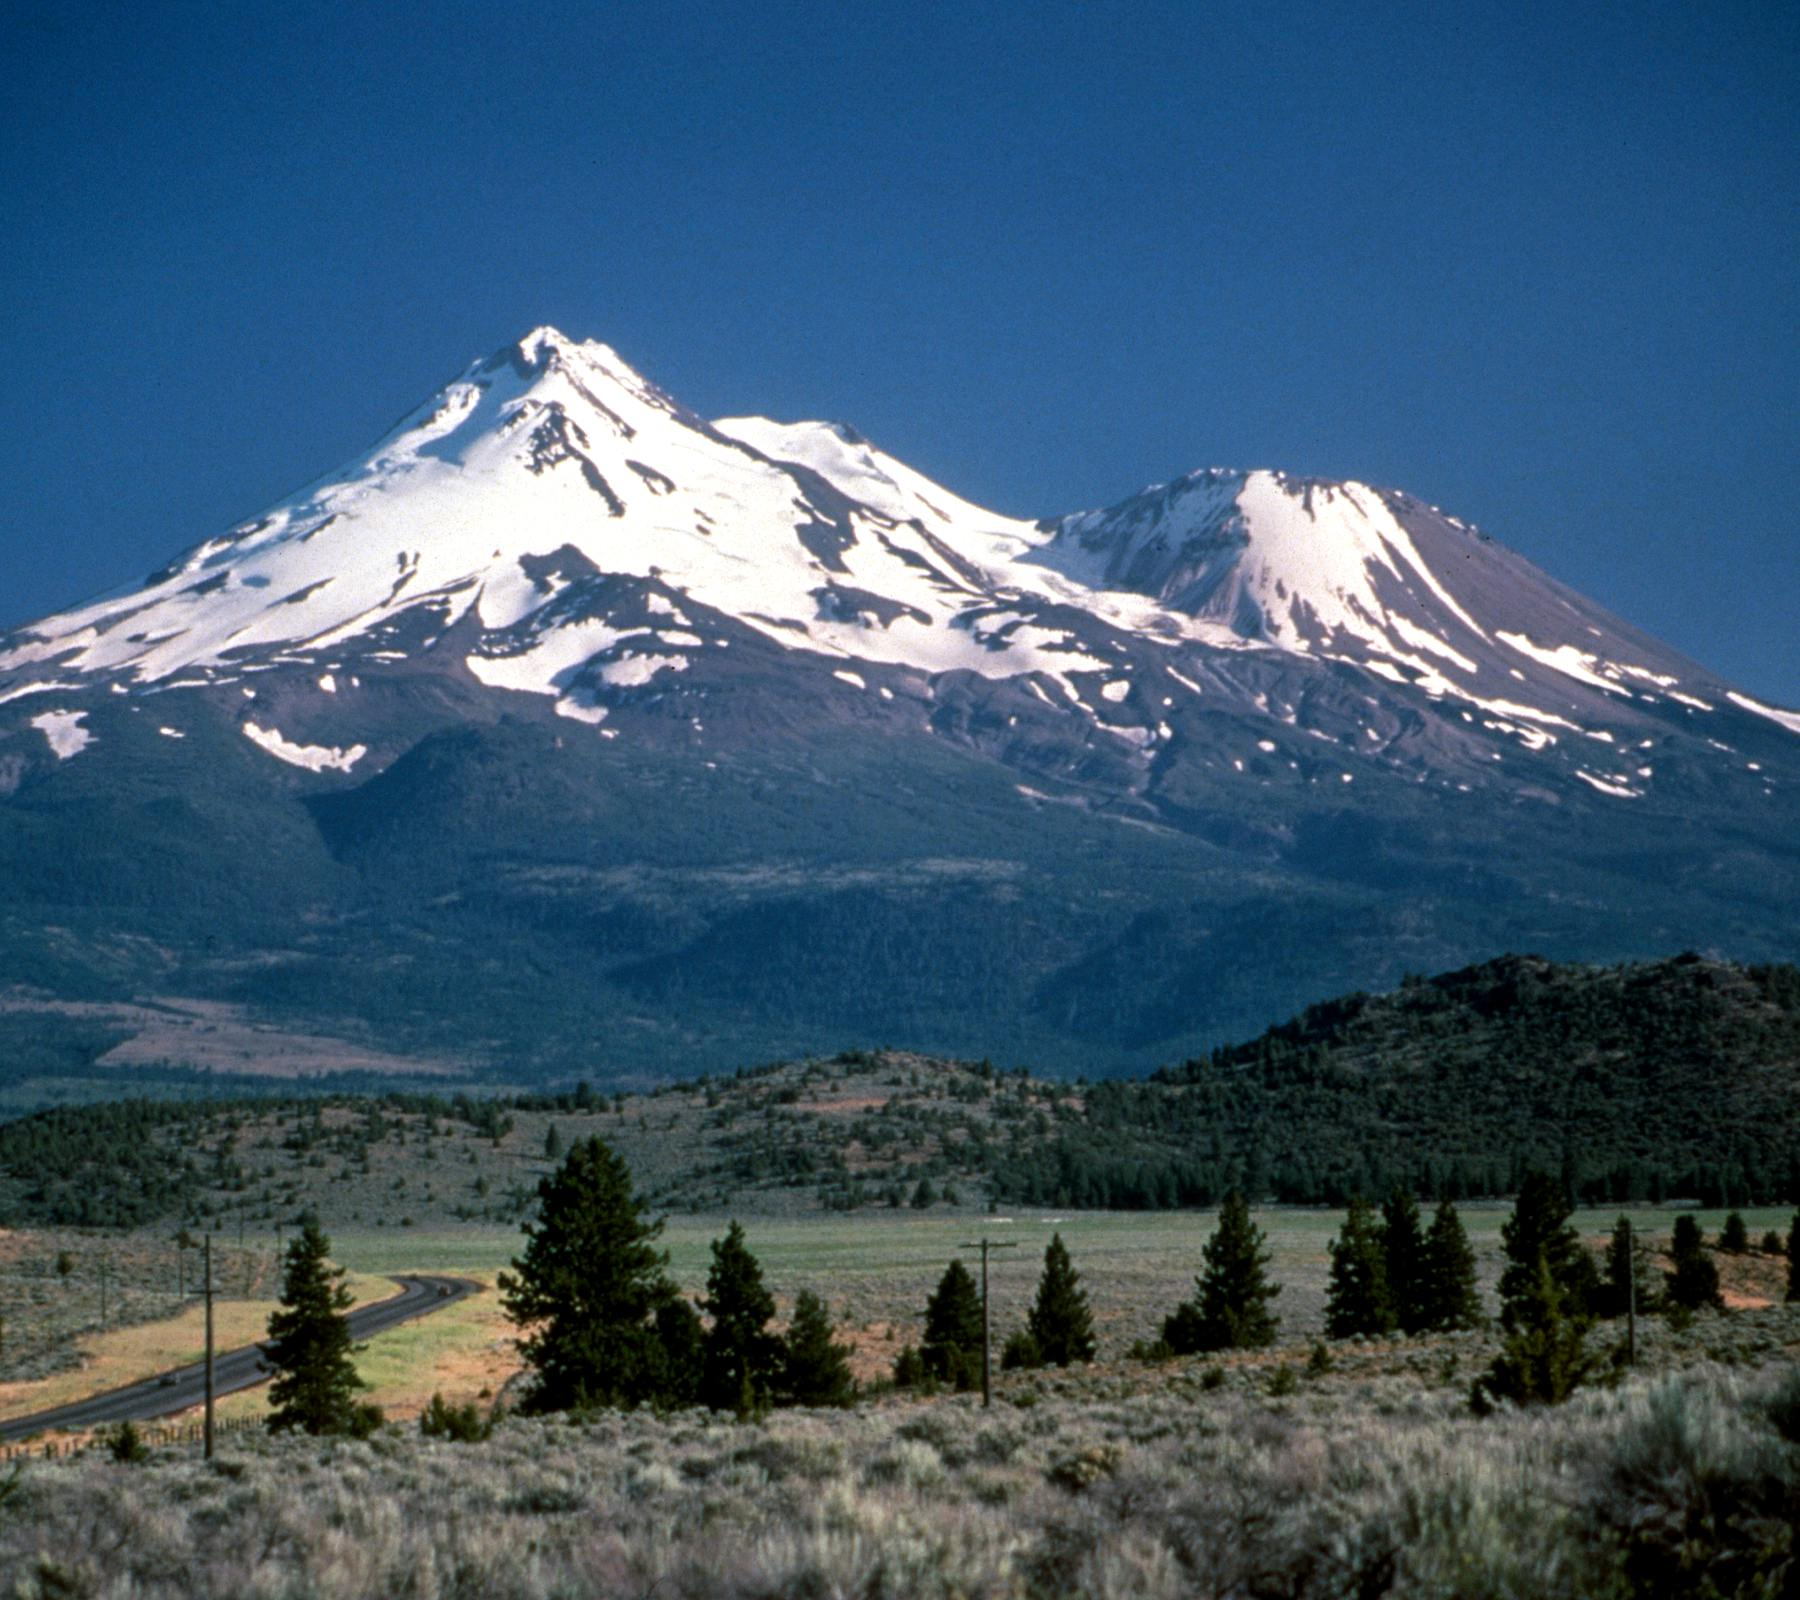 Mount Shasta Landscape Background 1800x1600 Background